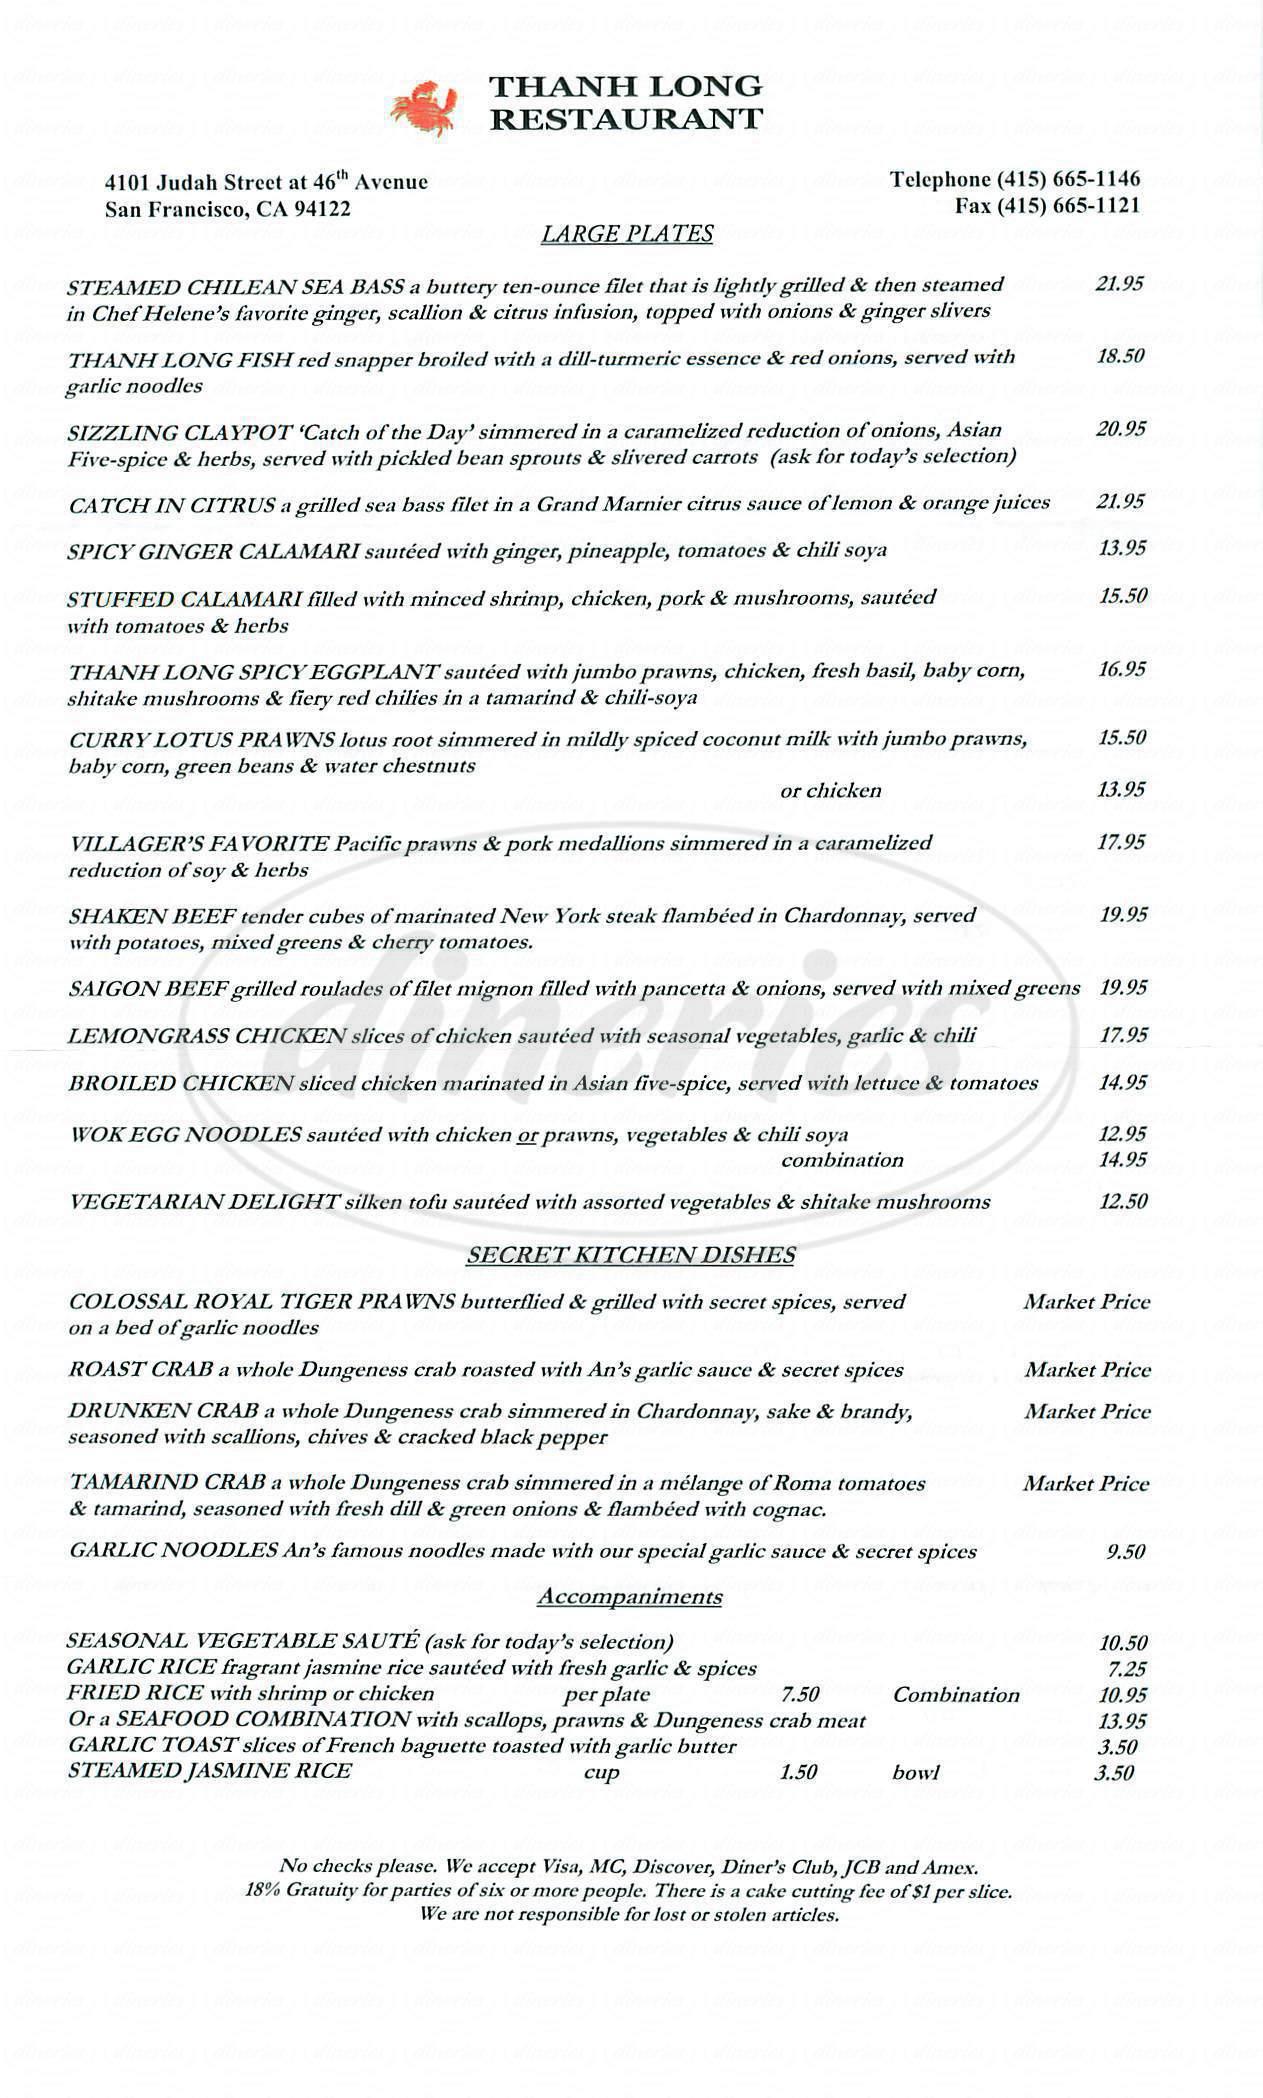 Thanh Long Restaurant San Francisco Ca